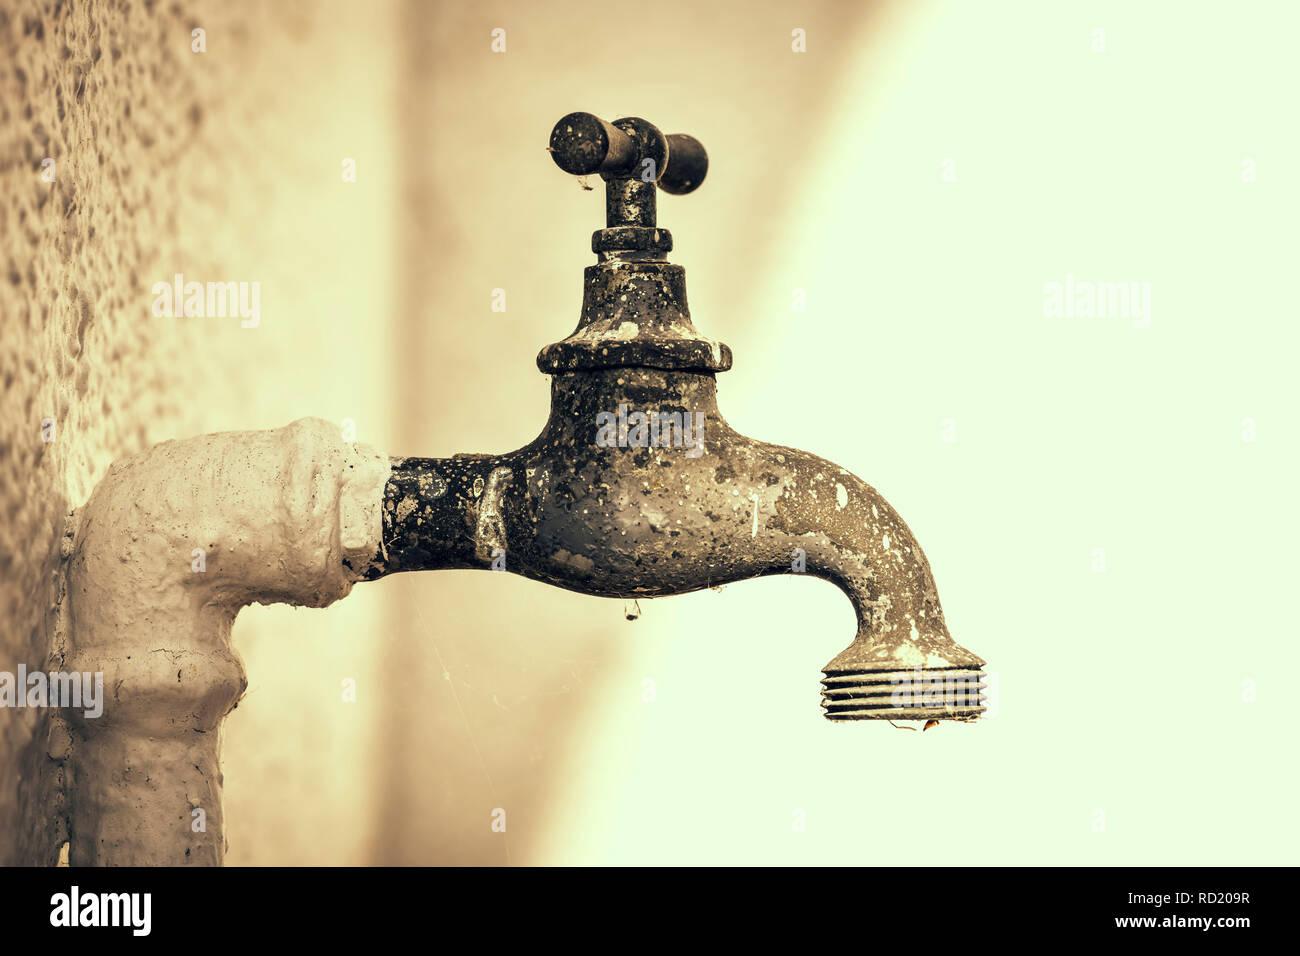 Old tap, Alter Wasserhahn Stock Photo